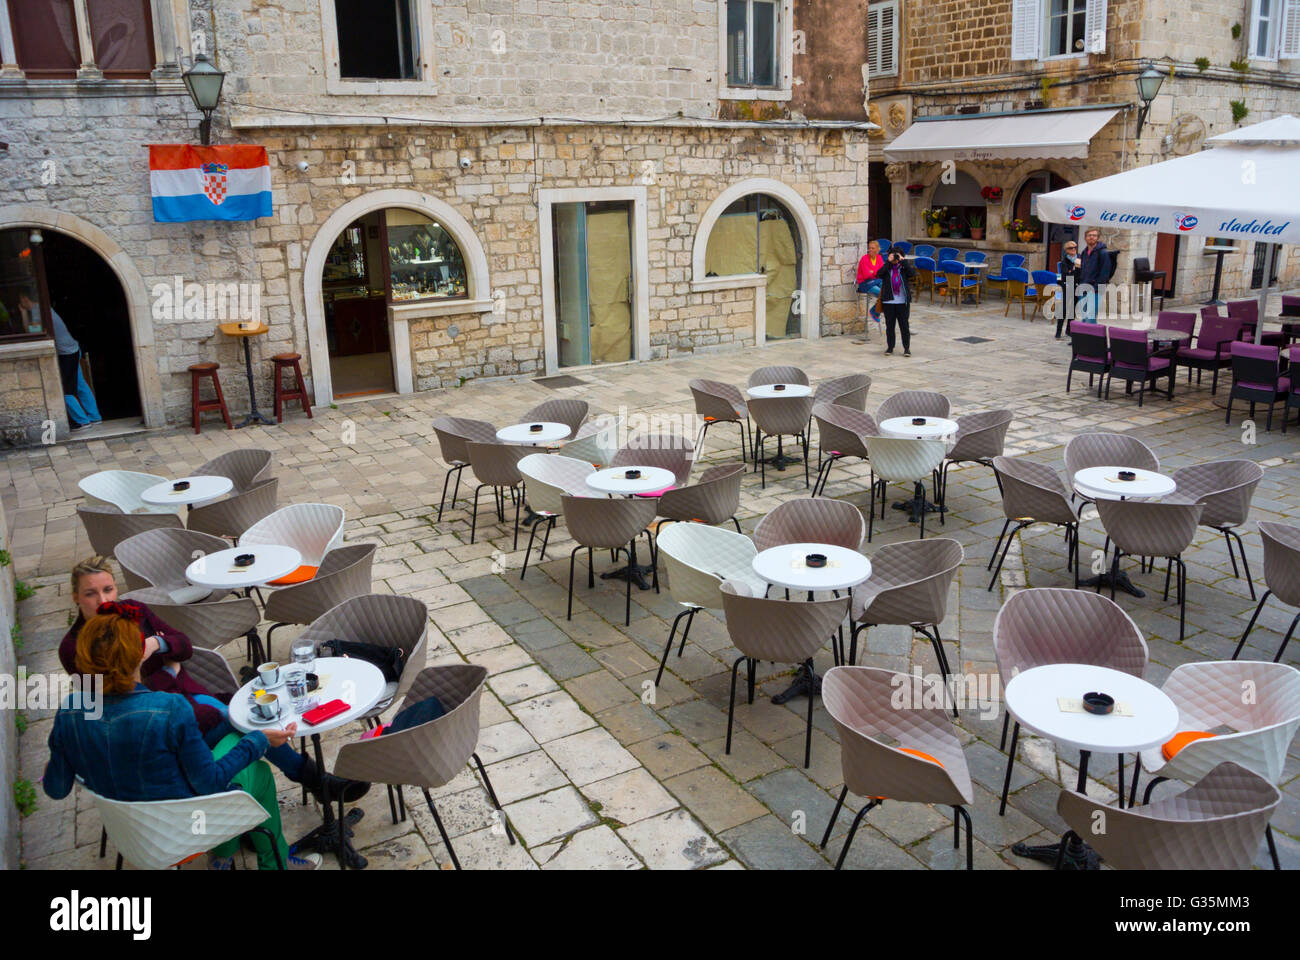 Cafe terraces, Trg Ivana Pavla II, old town, Trogir, Dalmatia, Croatia Stock Photo